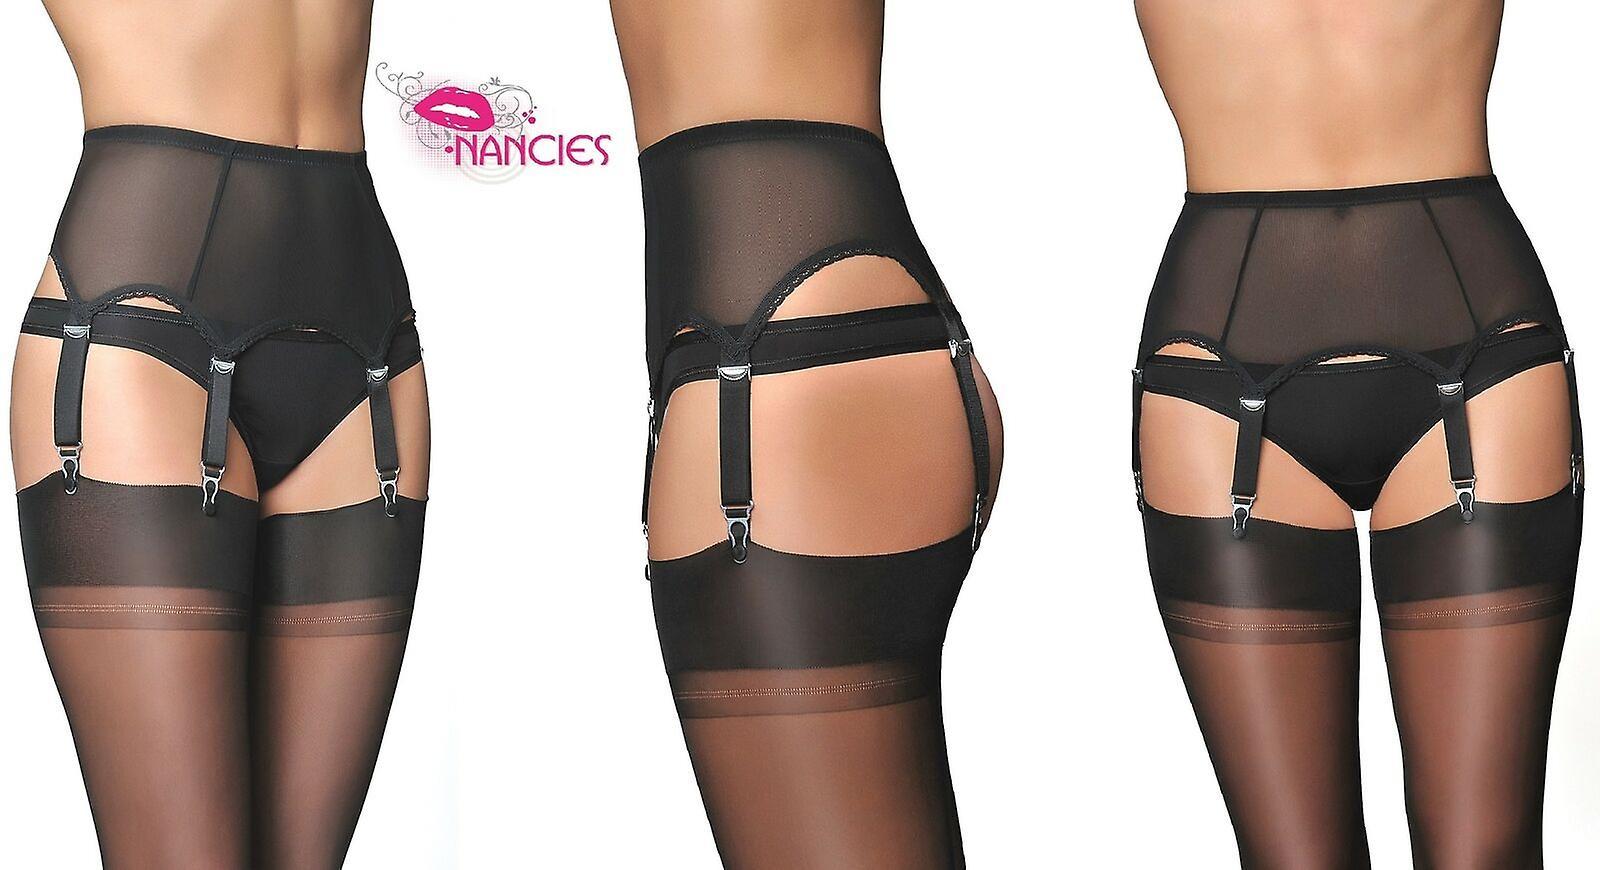 Black Power Mesh Suspender belt with FREE Stockings